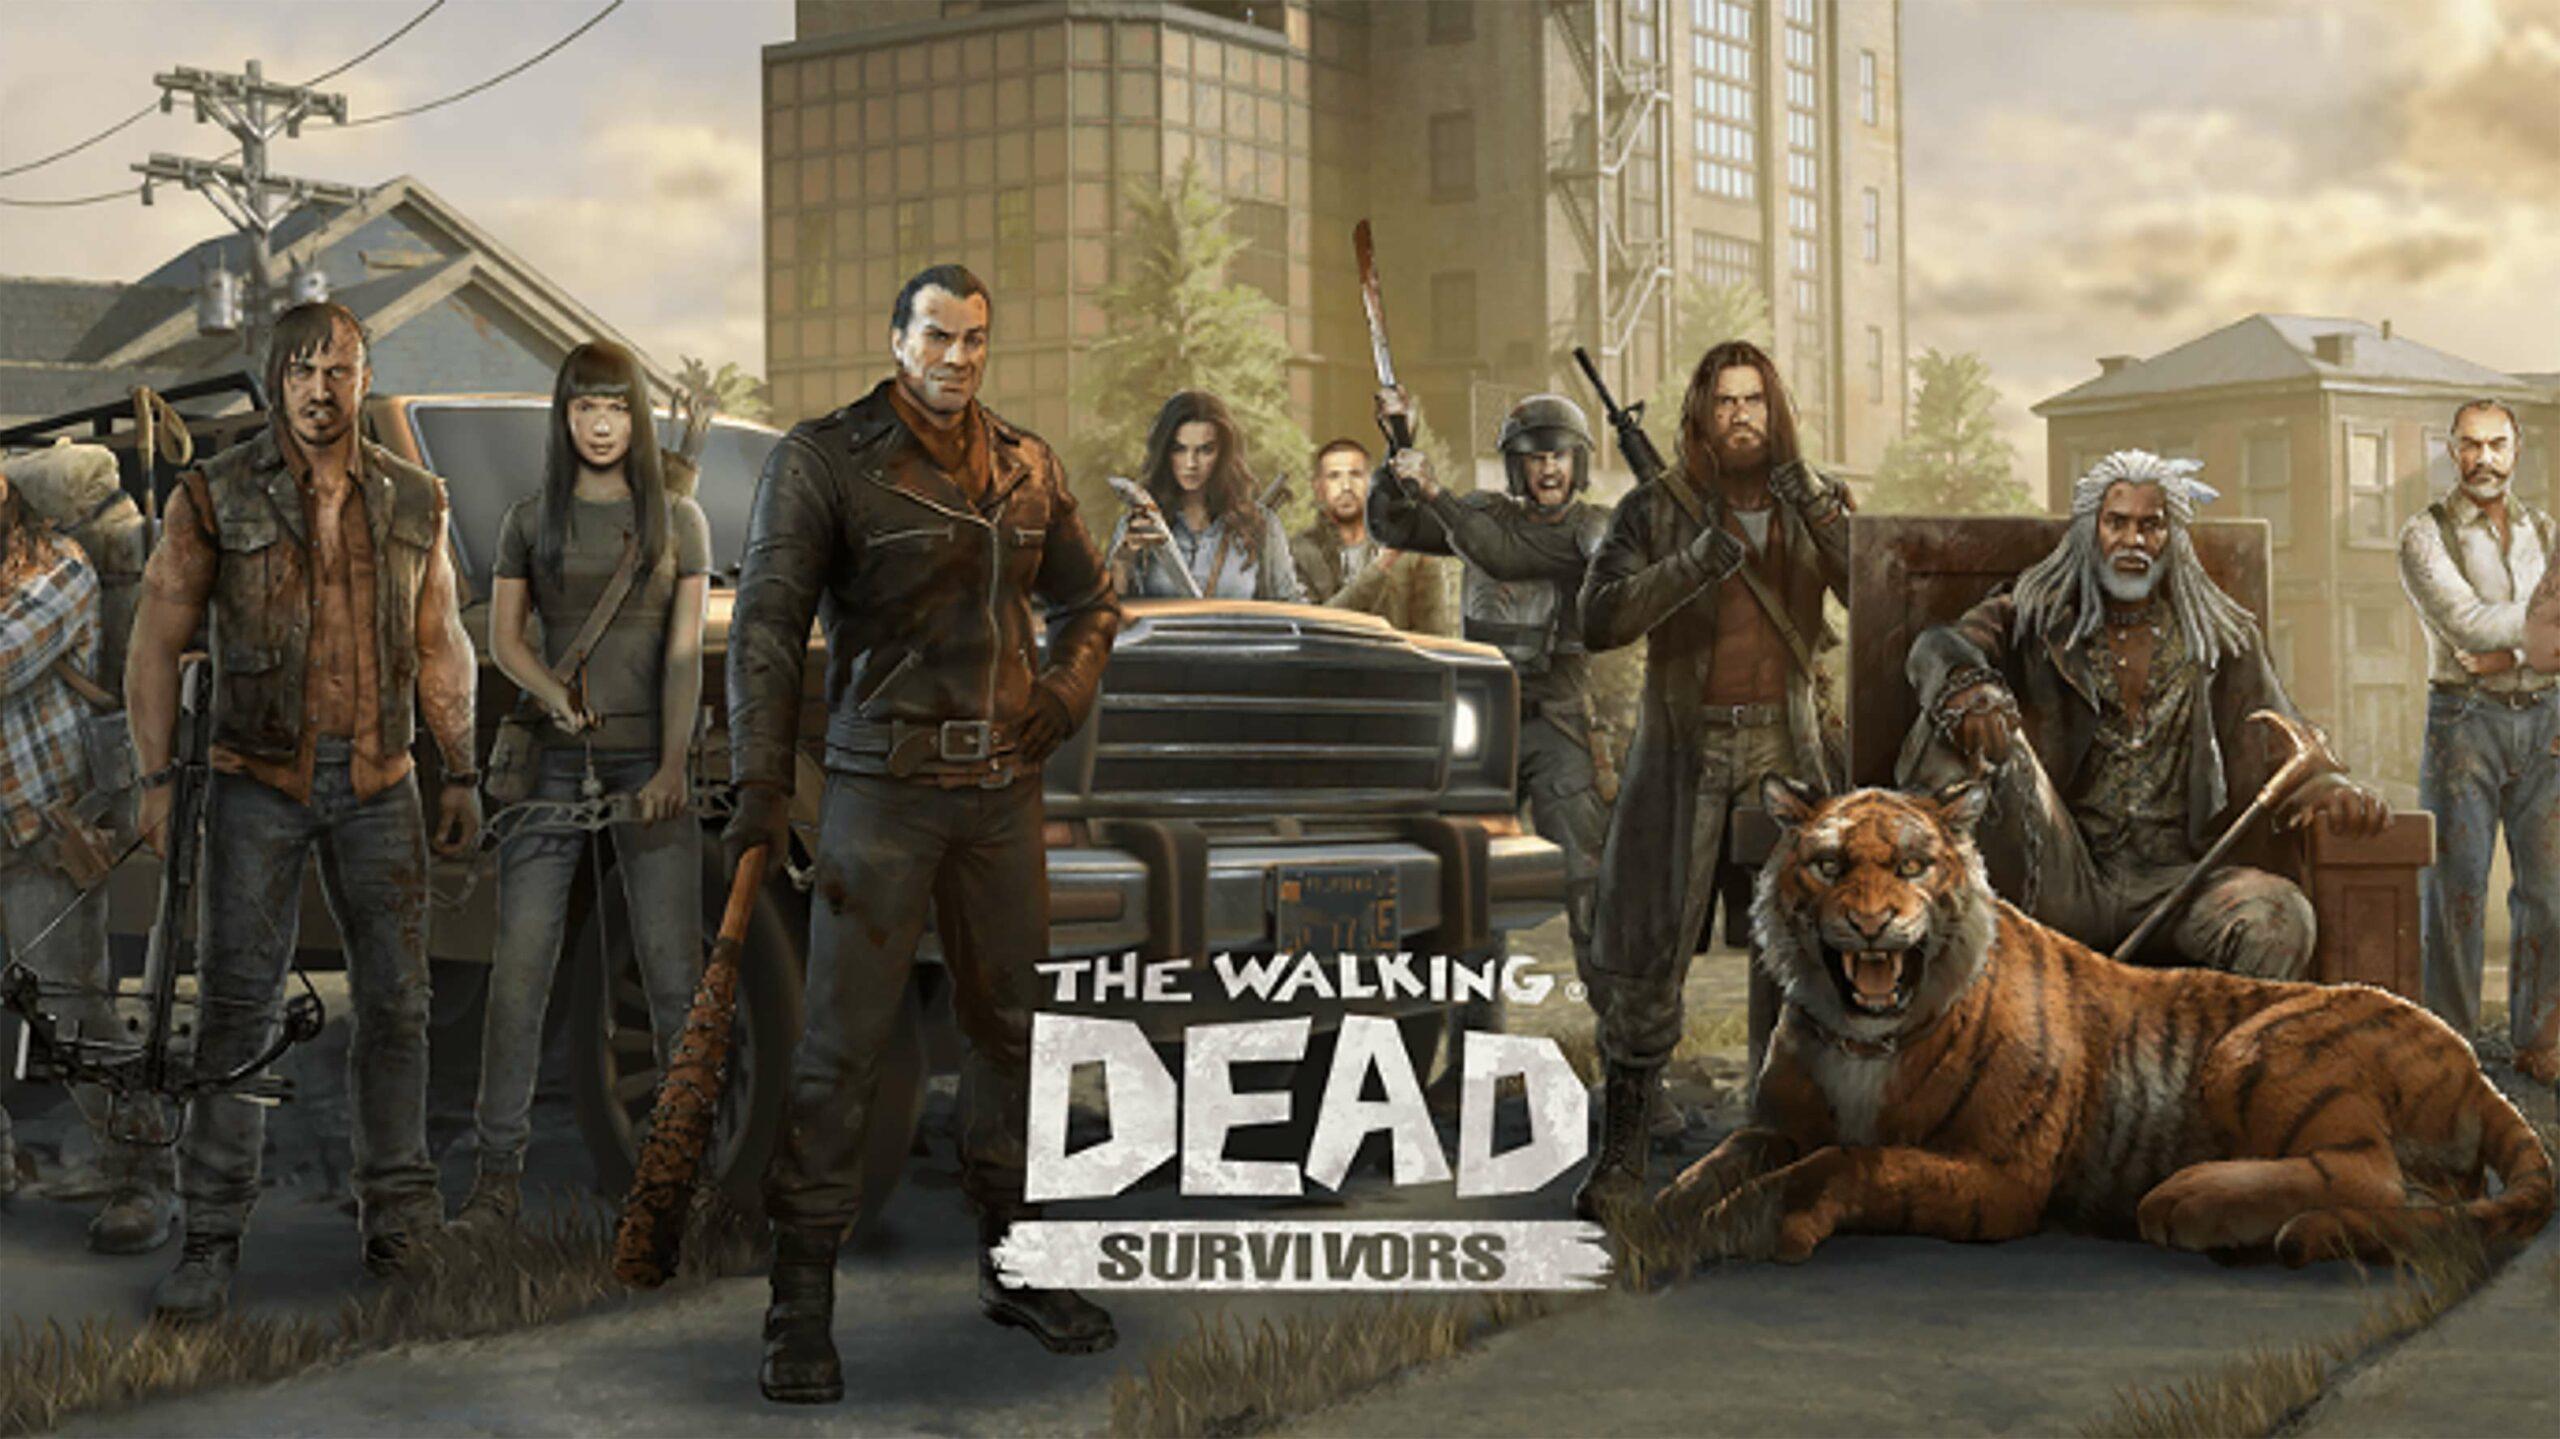 The Walking Dead Survivors